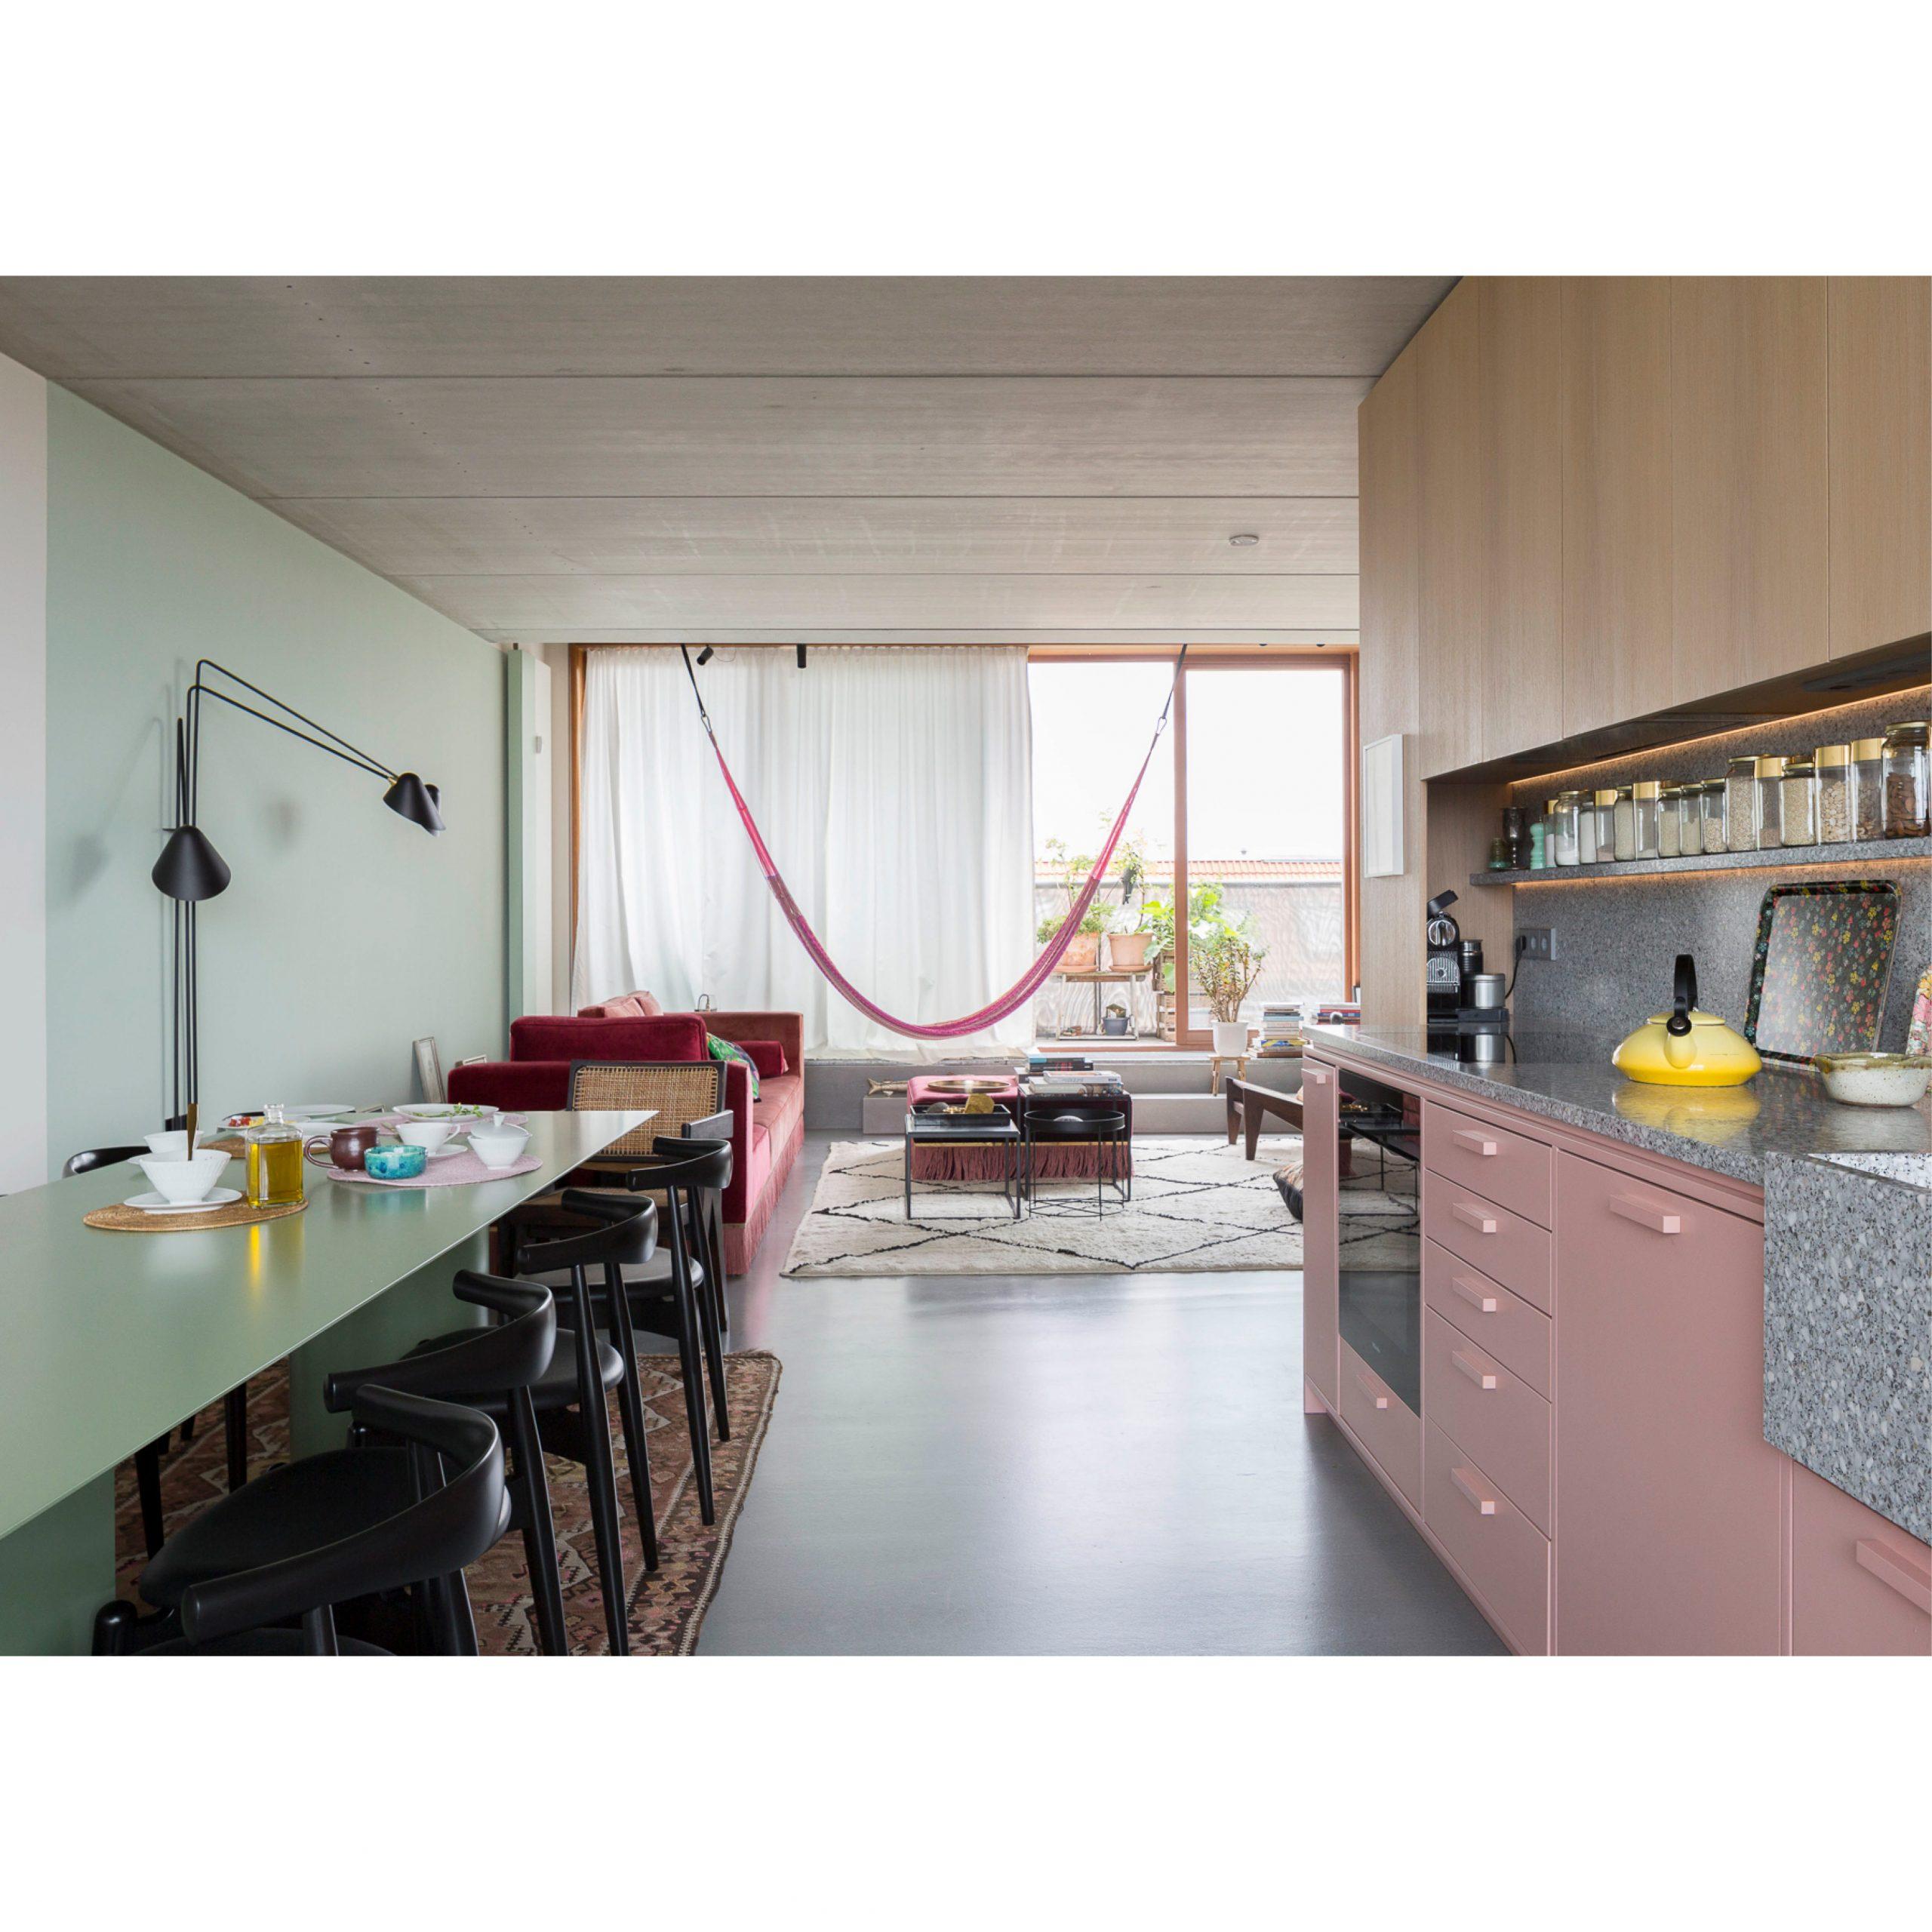 Ester Bruzkus Interior Kitchen ©Caroline Prange_5